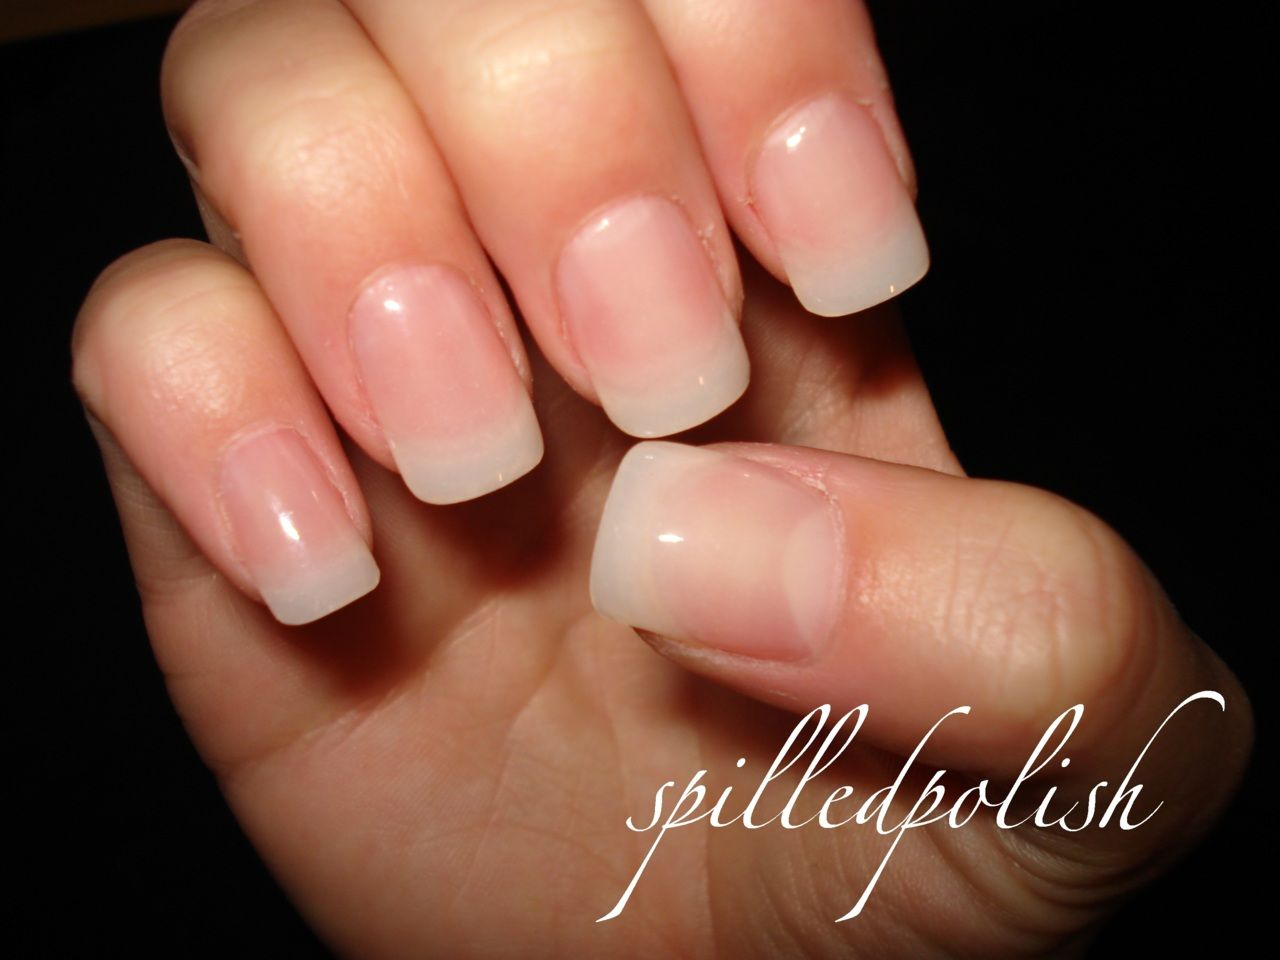 Spilledpolish Powder Gel Nails Natural Acrylic Nails Natural Looking Acrylic Nails Clear Gel Nails